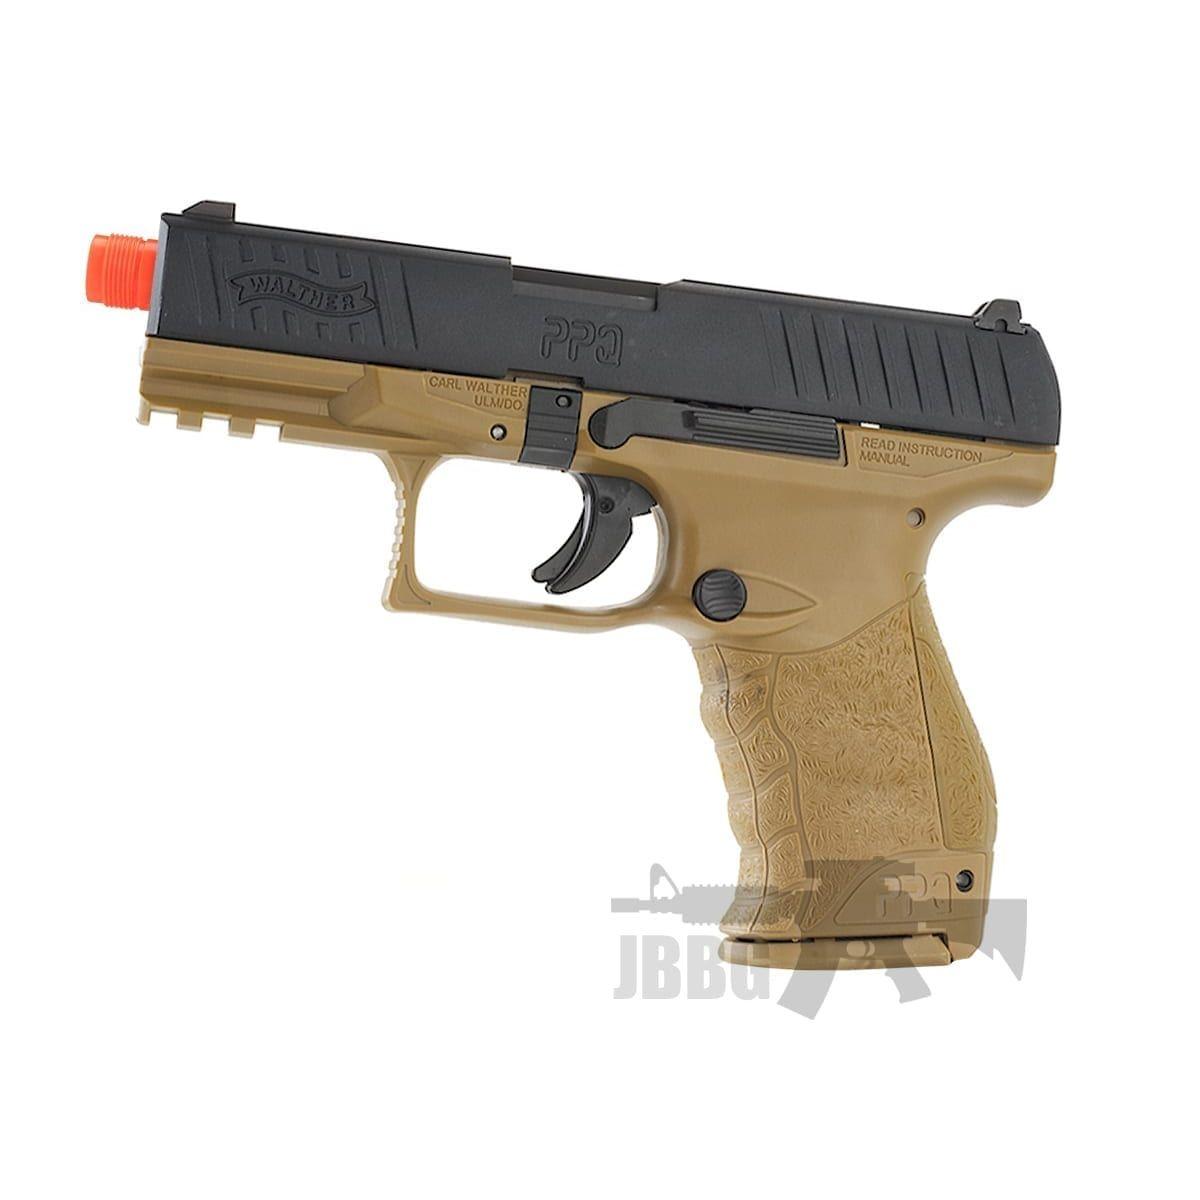 ppq pistol